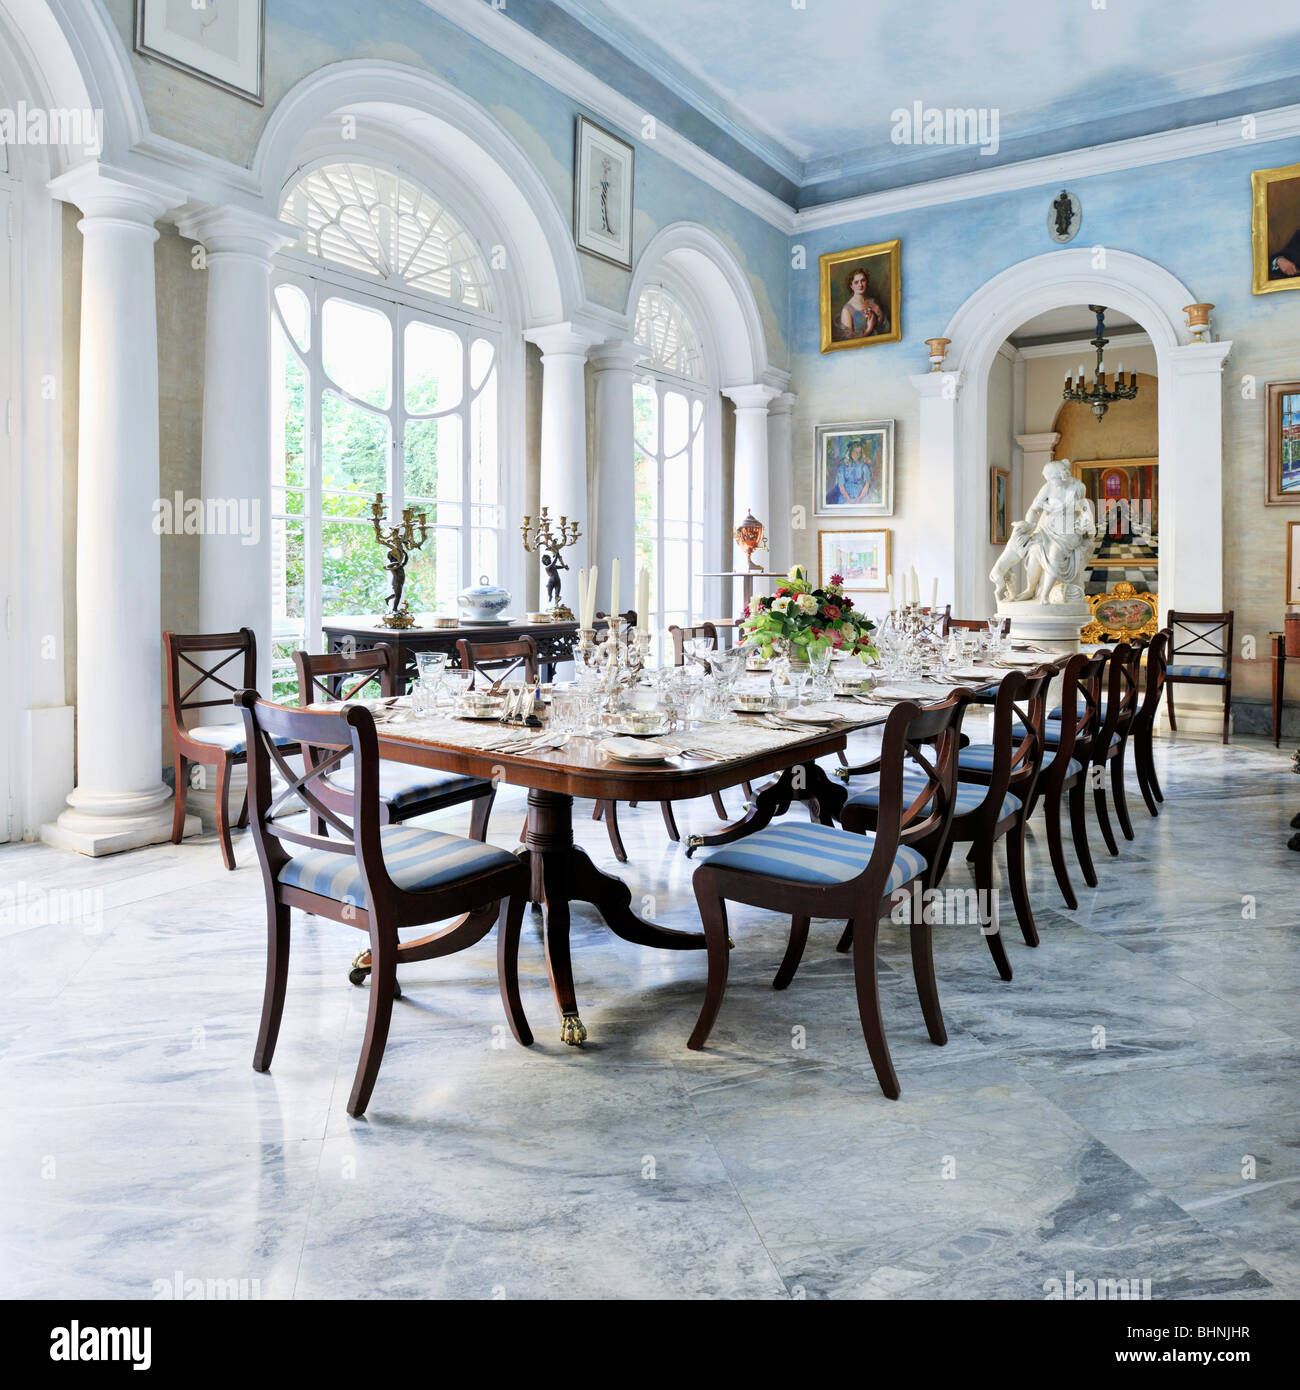 Summer dining room, Casa Rocca Piccola - Stock Image